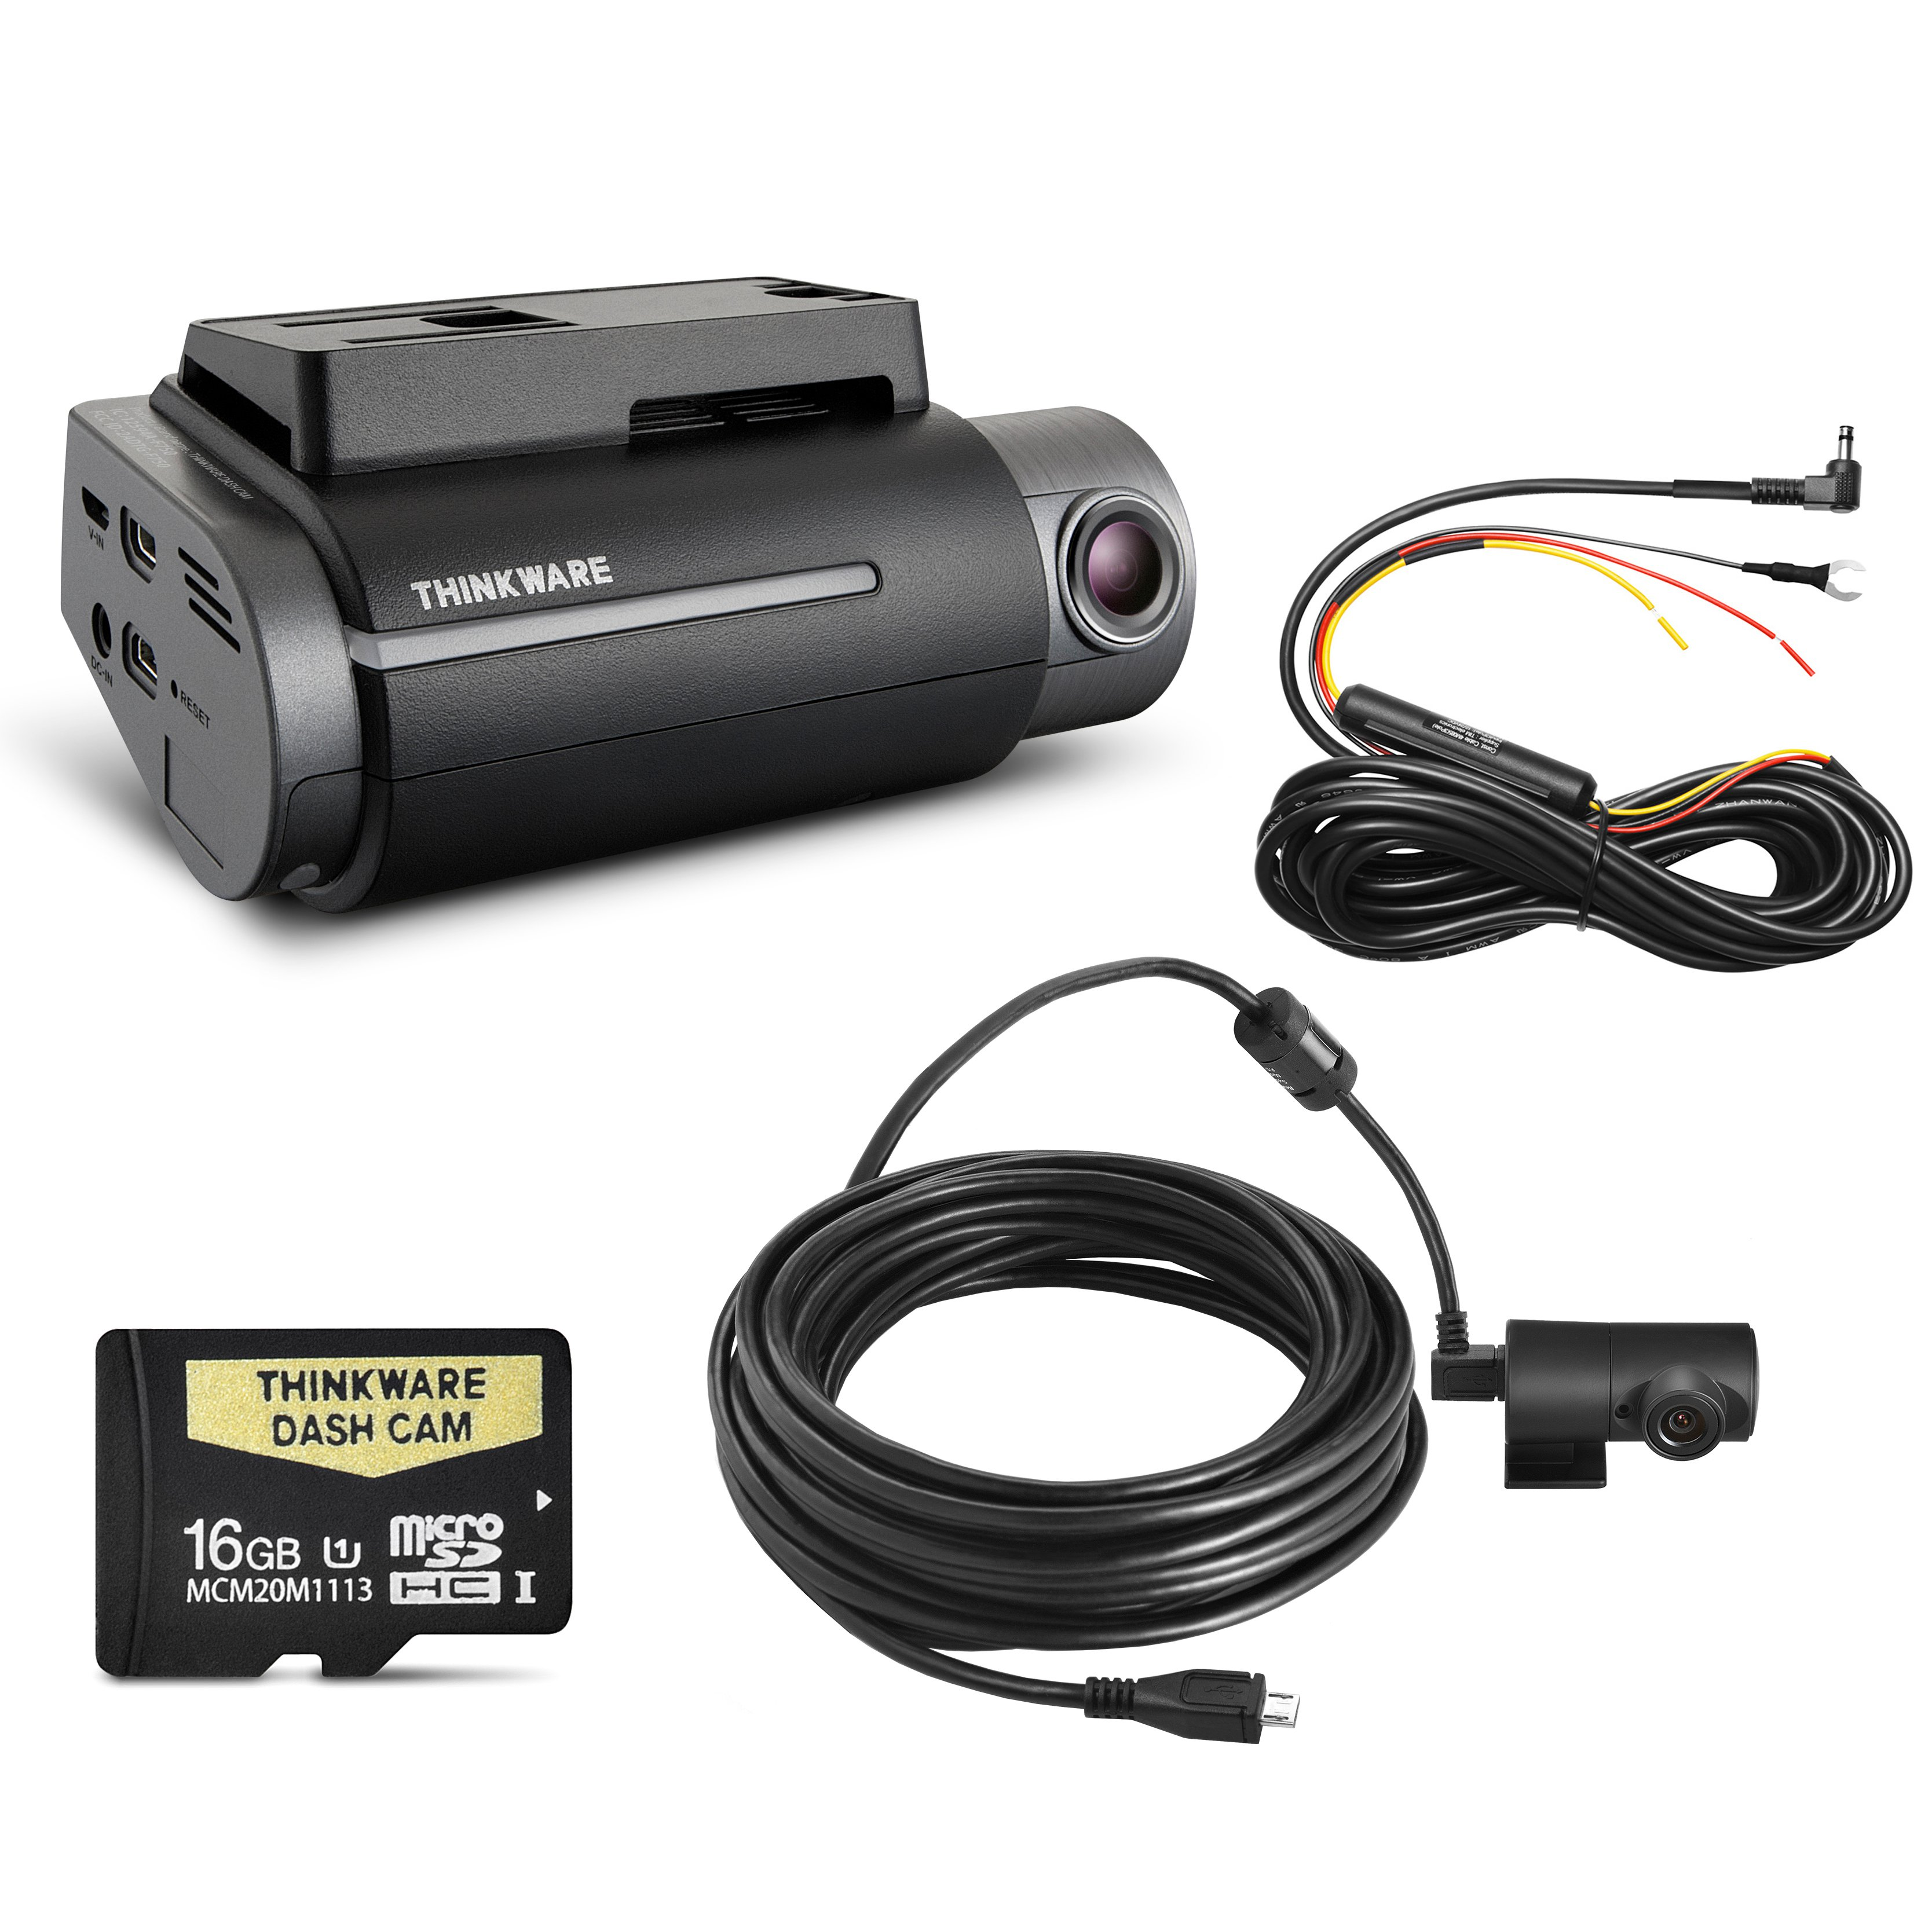 thinkware f750 dash camera kit 16gb front rear carbon. Black Bedroom Furniture Sets. Home Design Ideas